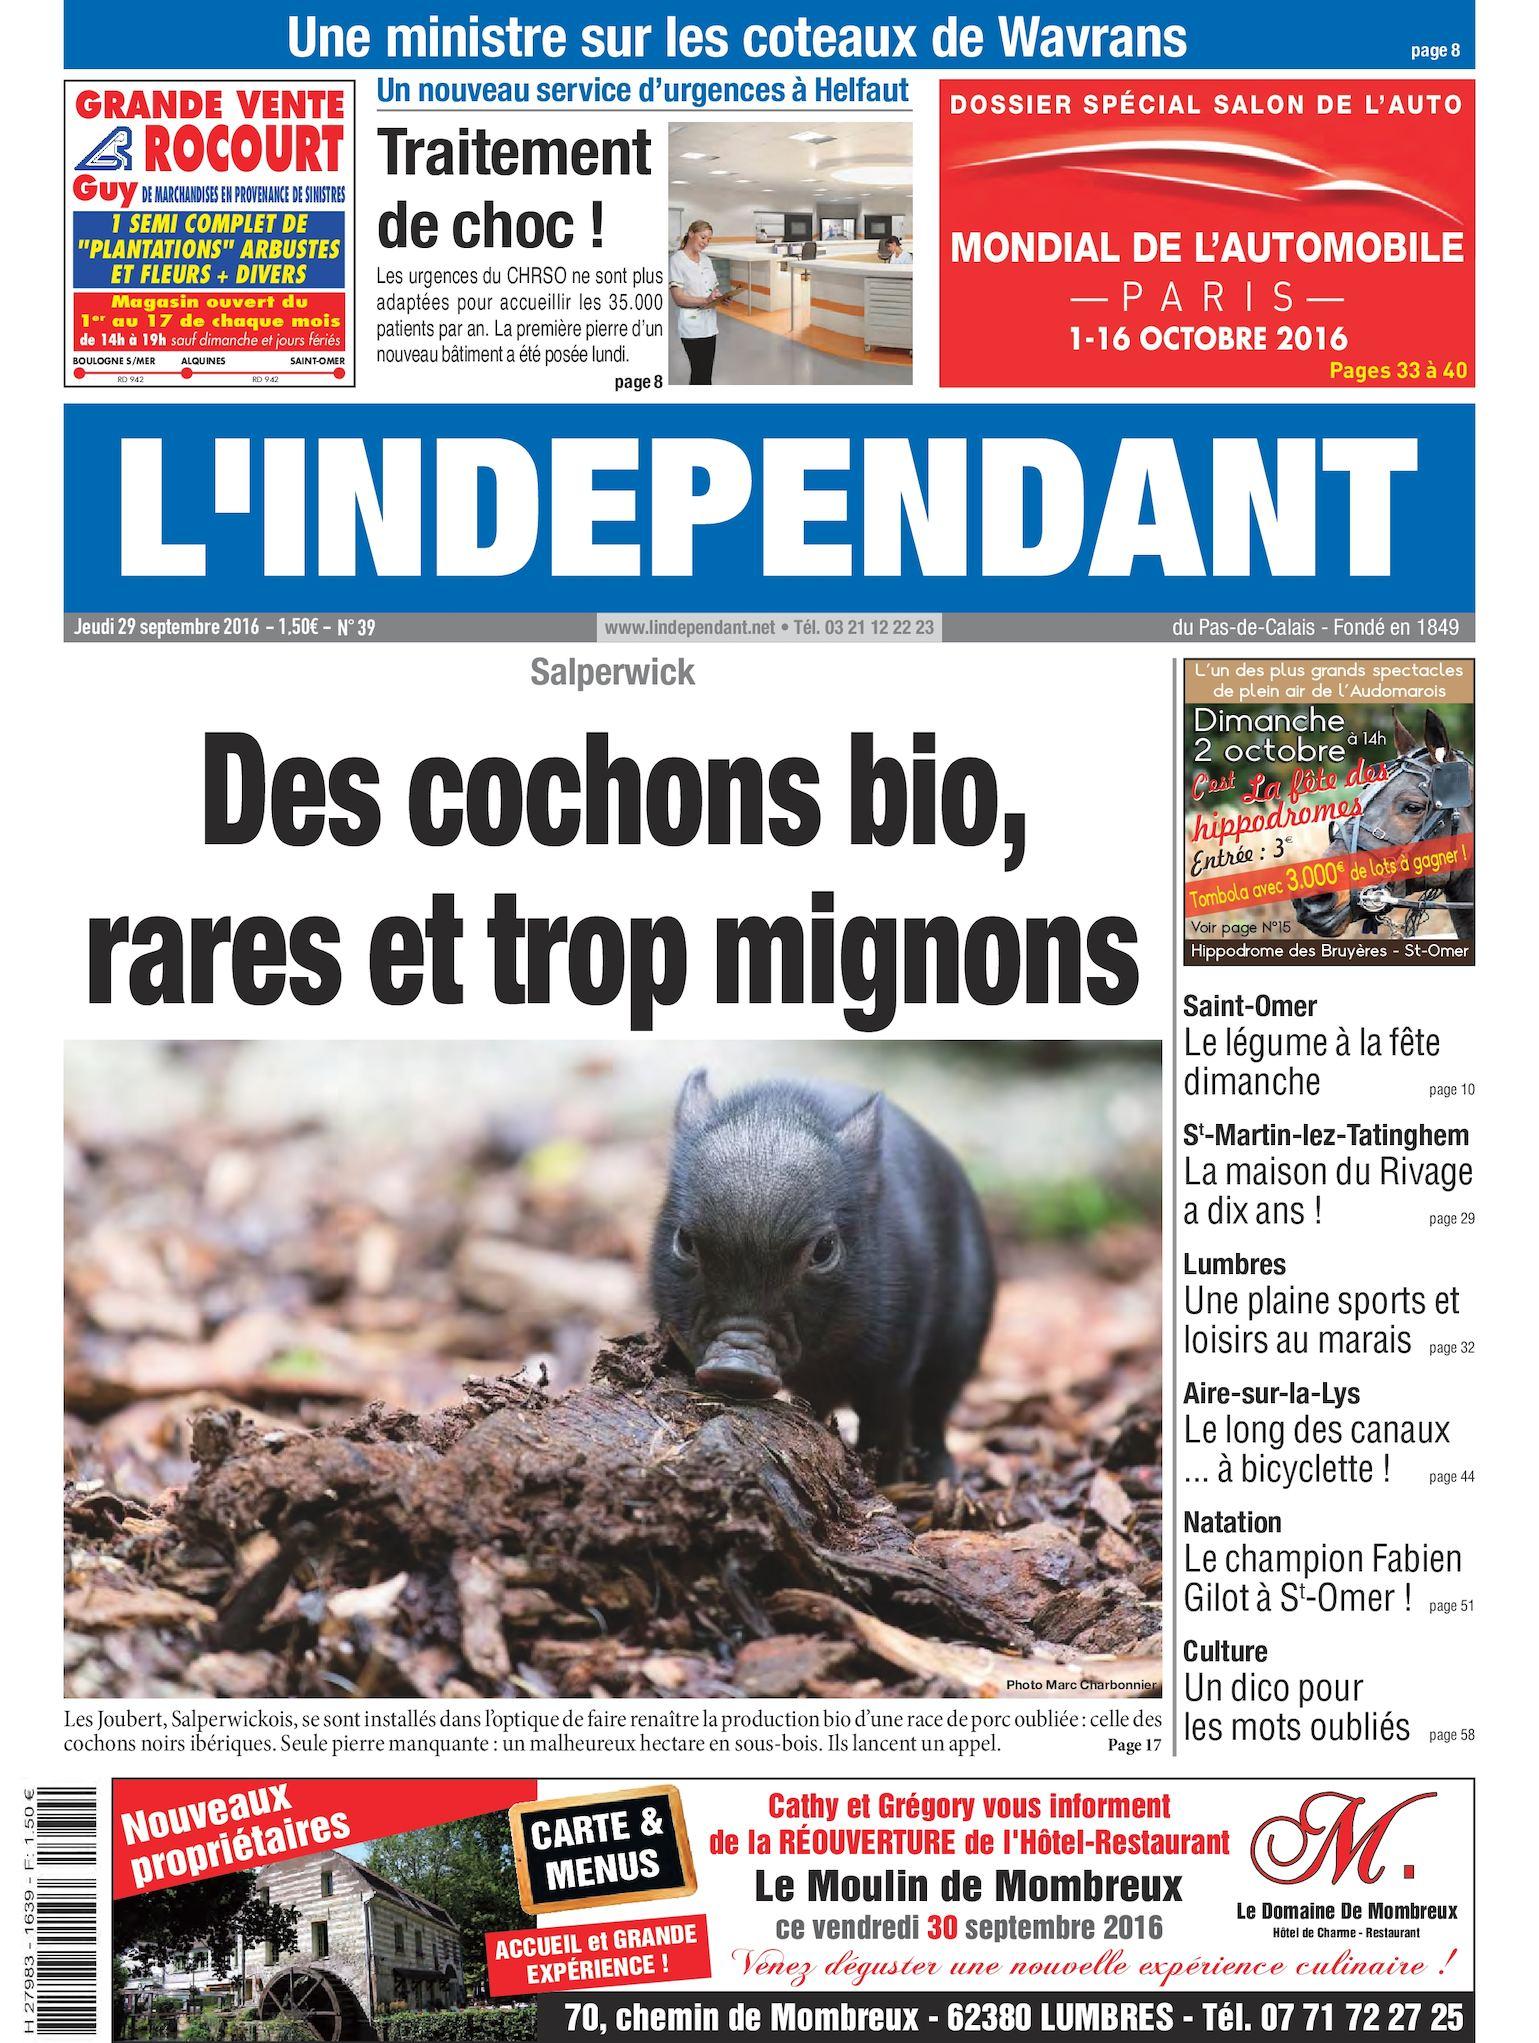 Calaméo - L indépendant Semaine 39 2016 58f5e94745b0